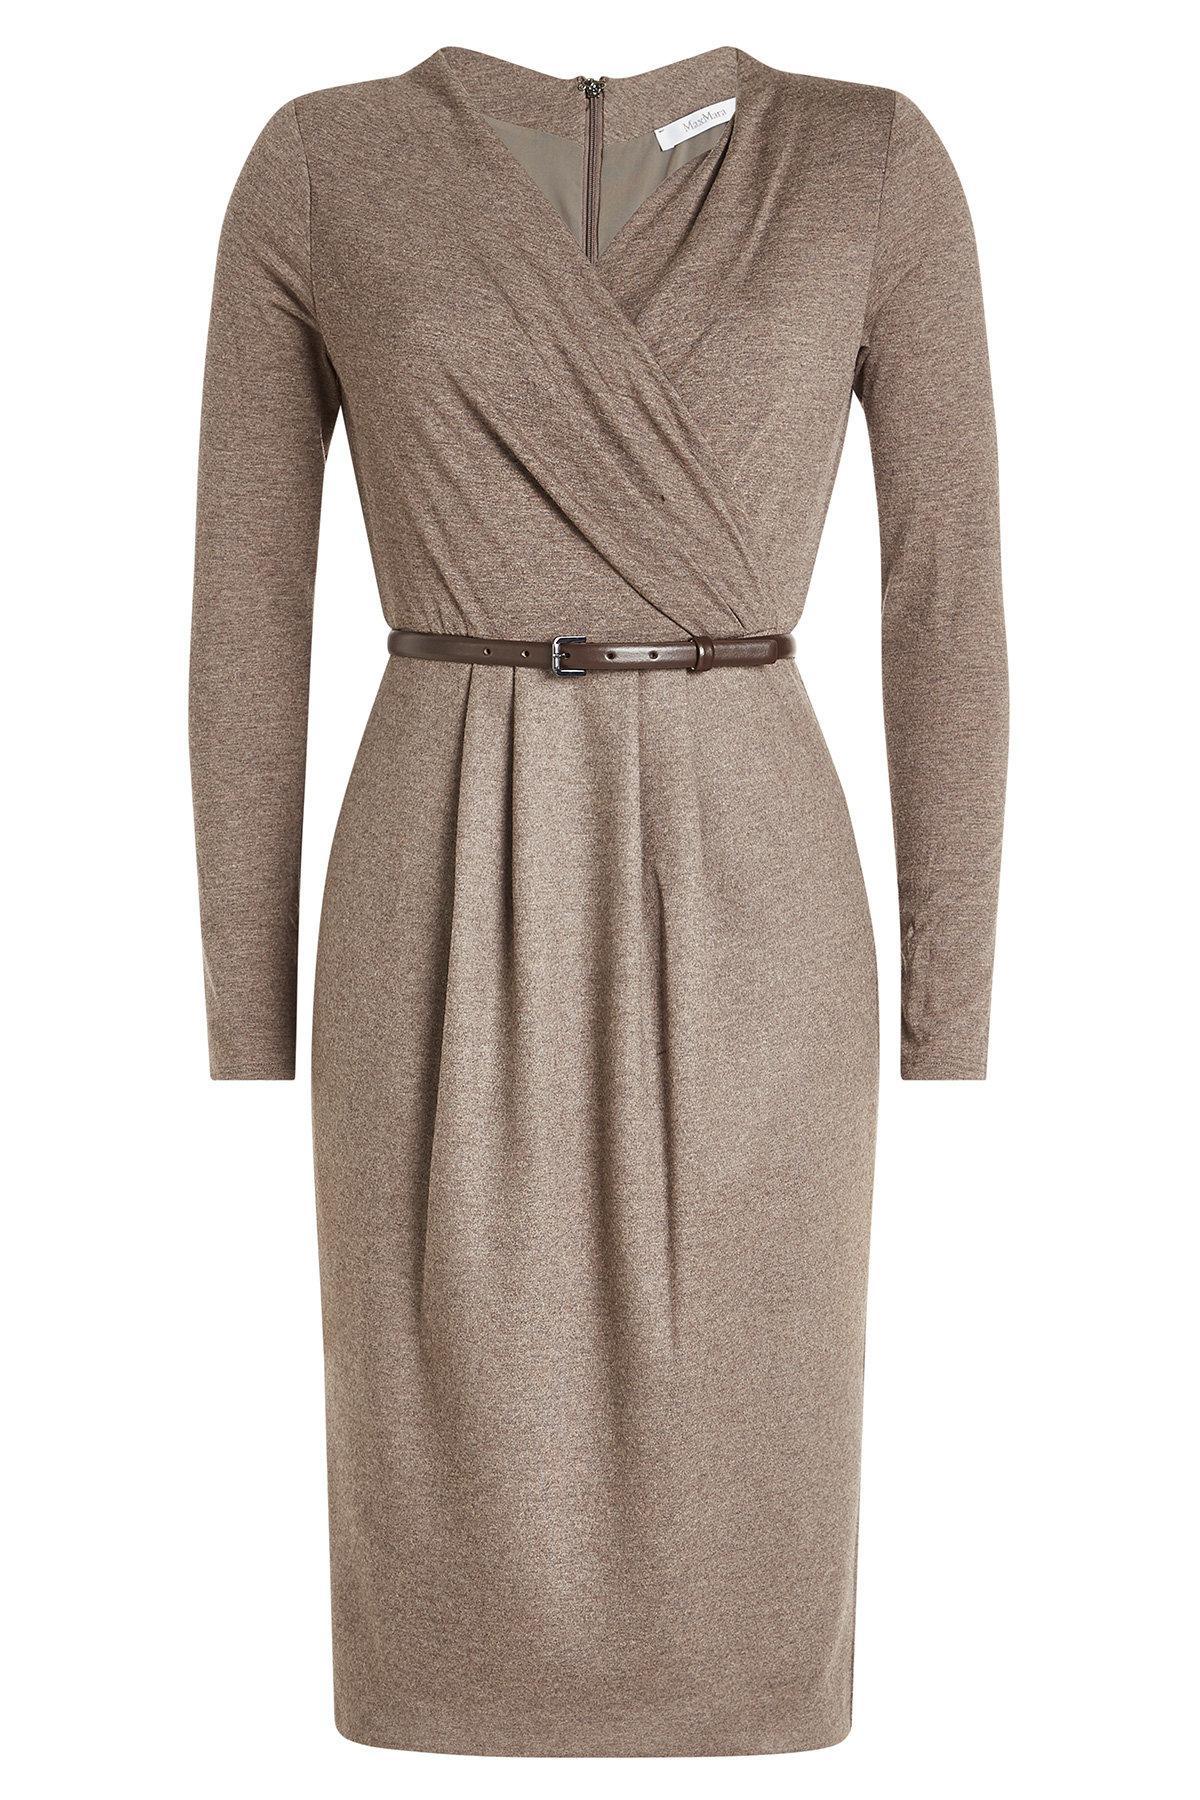 Max Mara Virgin Wool Dress With Leather Belt In Beige